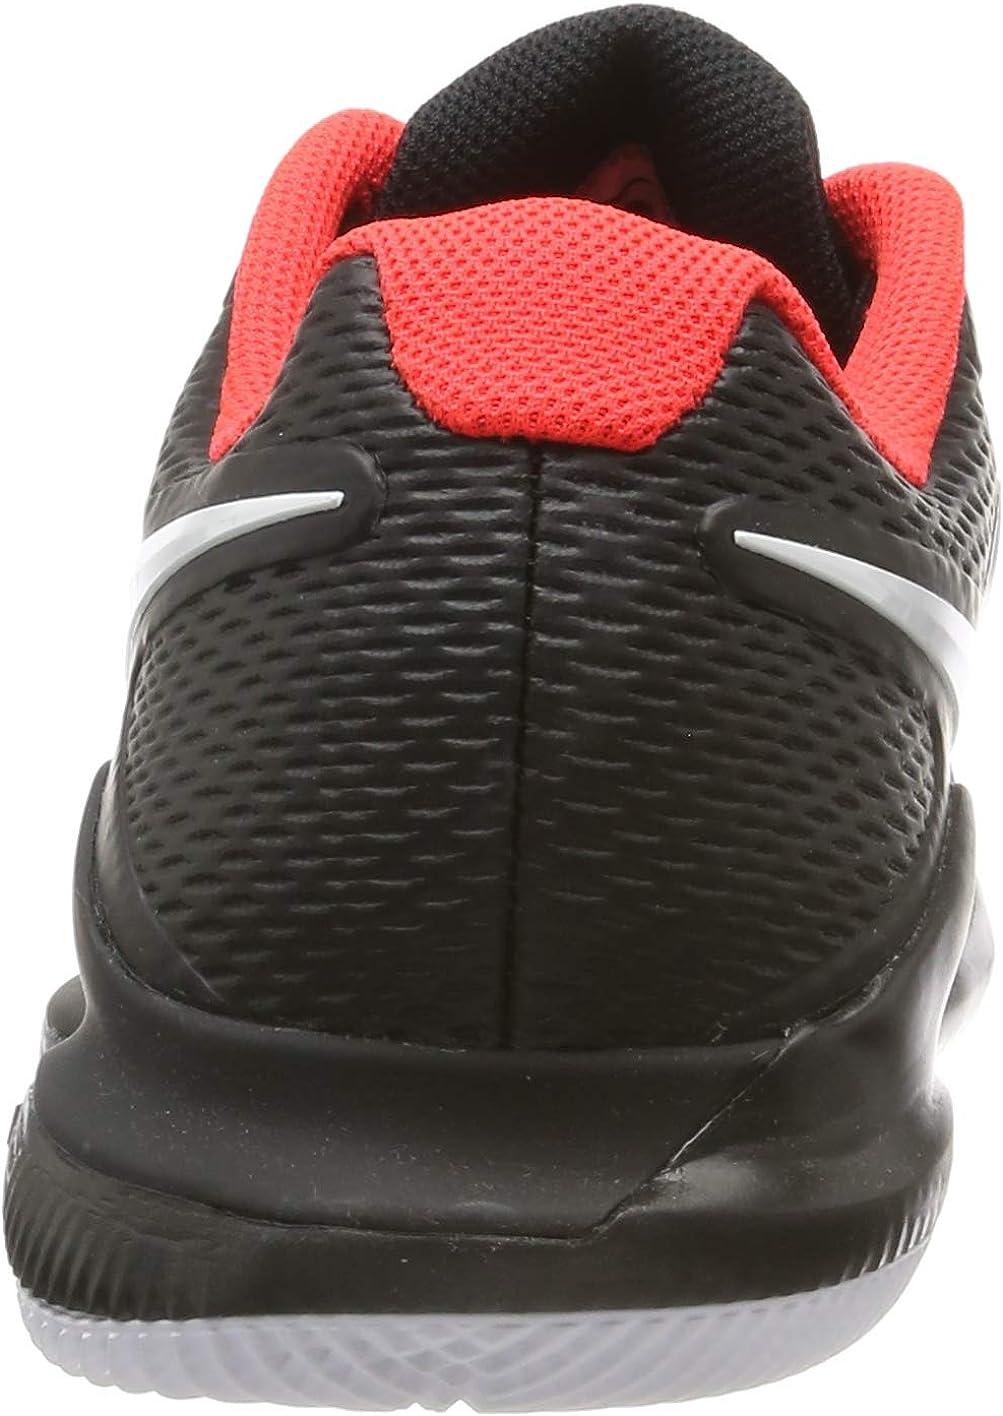 Nike Men's Fitness Shoes Black/White/Bright Crimson